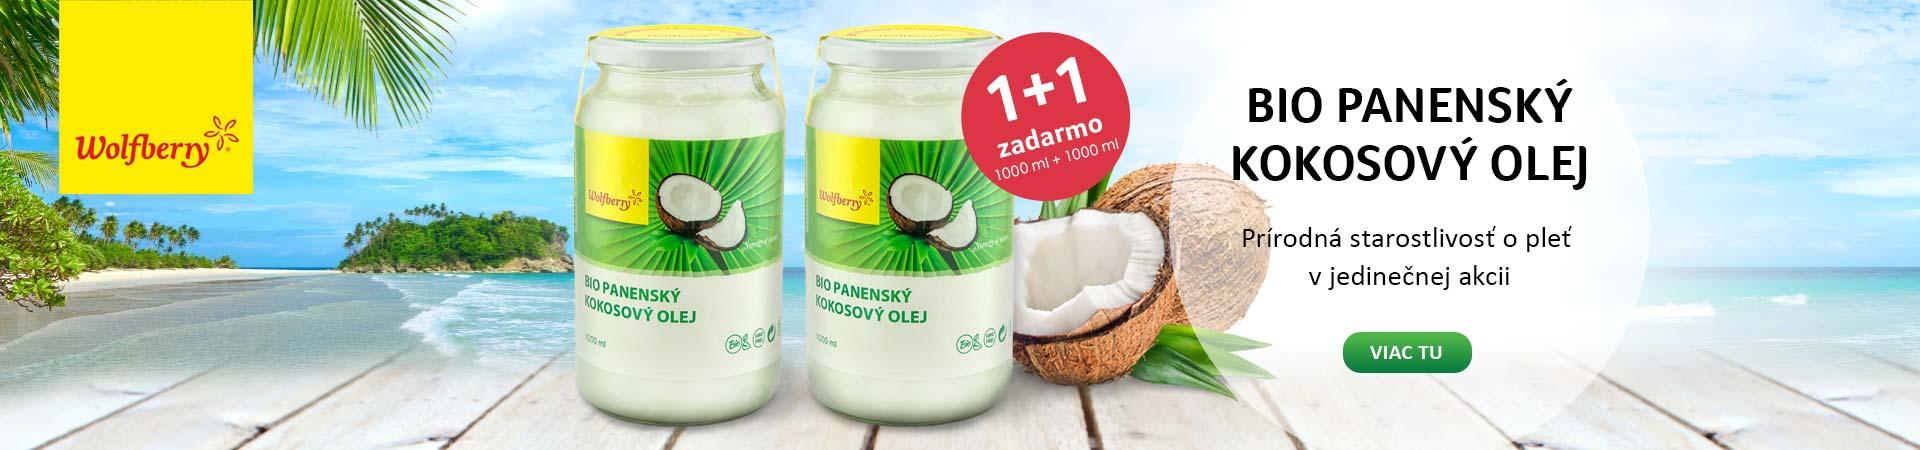 Wolfberry kokosový olej 1+1